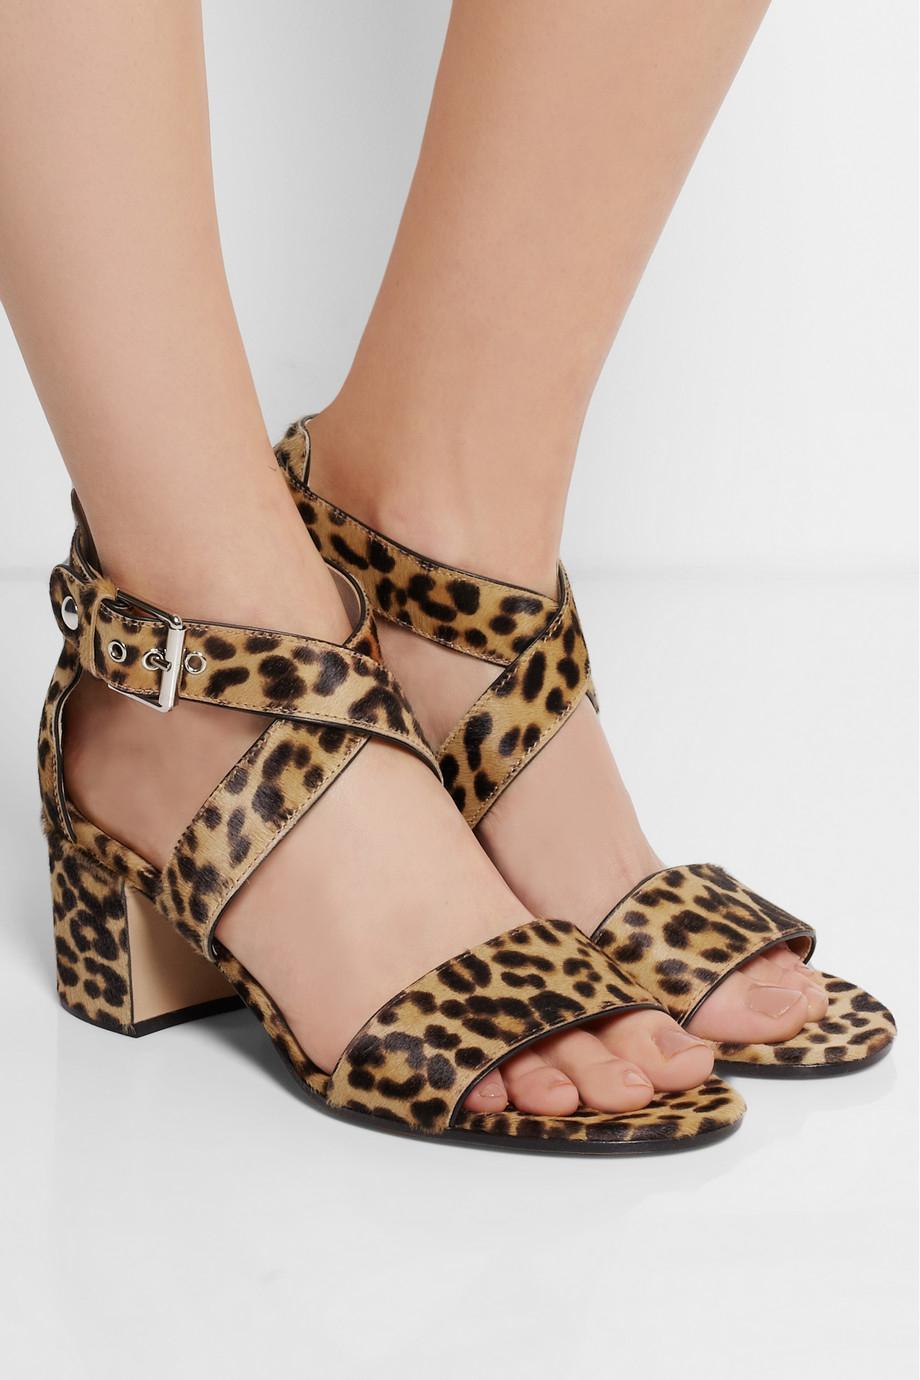 Gianvito Rossi Leopard Print Calf Hair Sandals Lyst